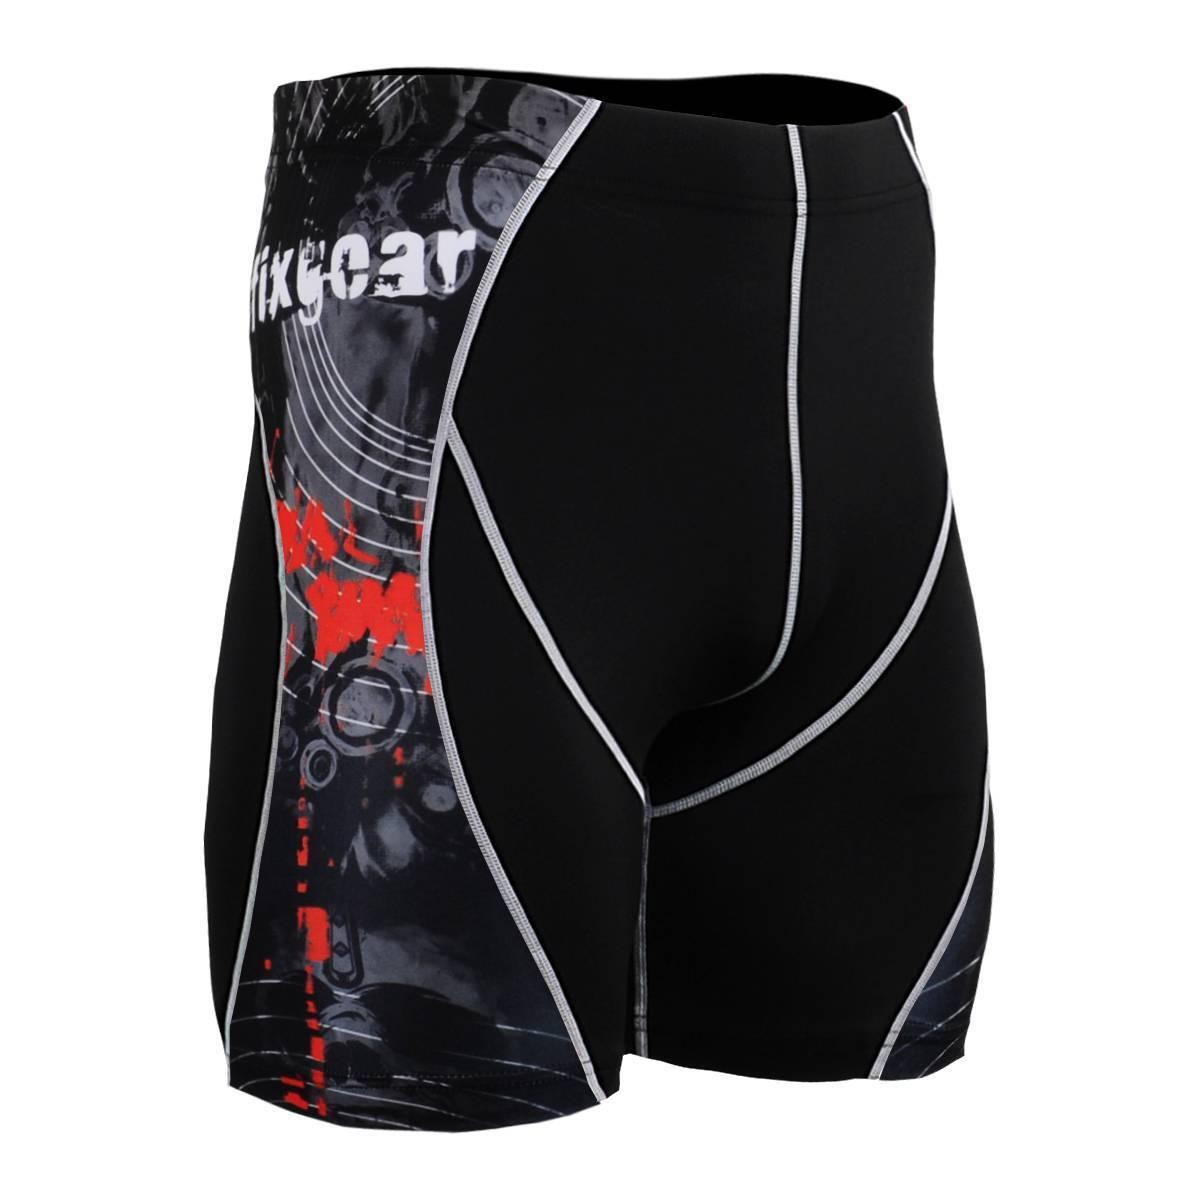 FIXGEAR P2S-B30 Compression Skin Tights Shorts MMA Workout Yoga Fitness Crossfit